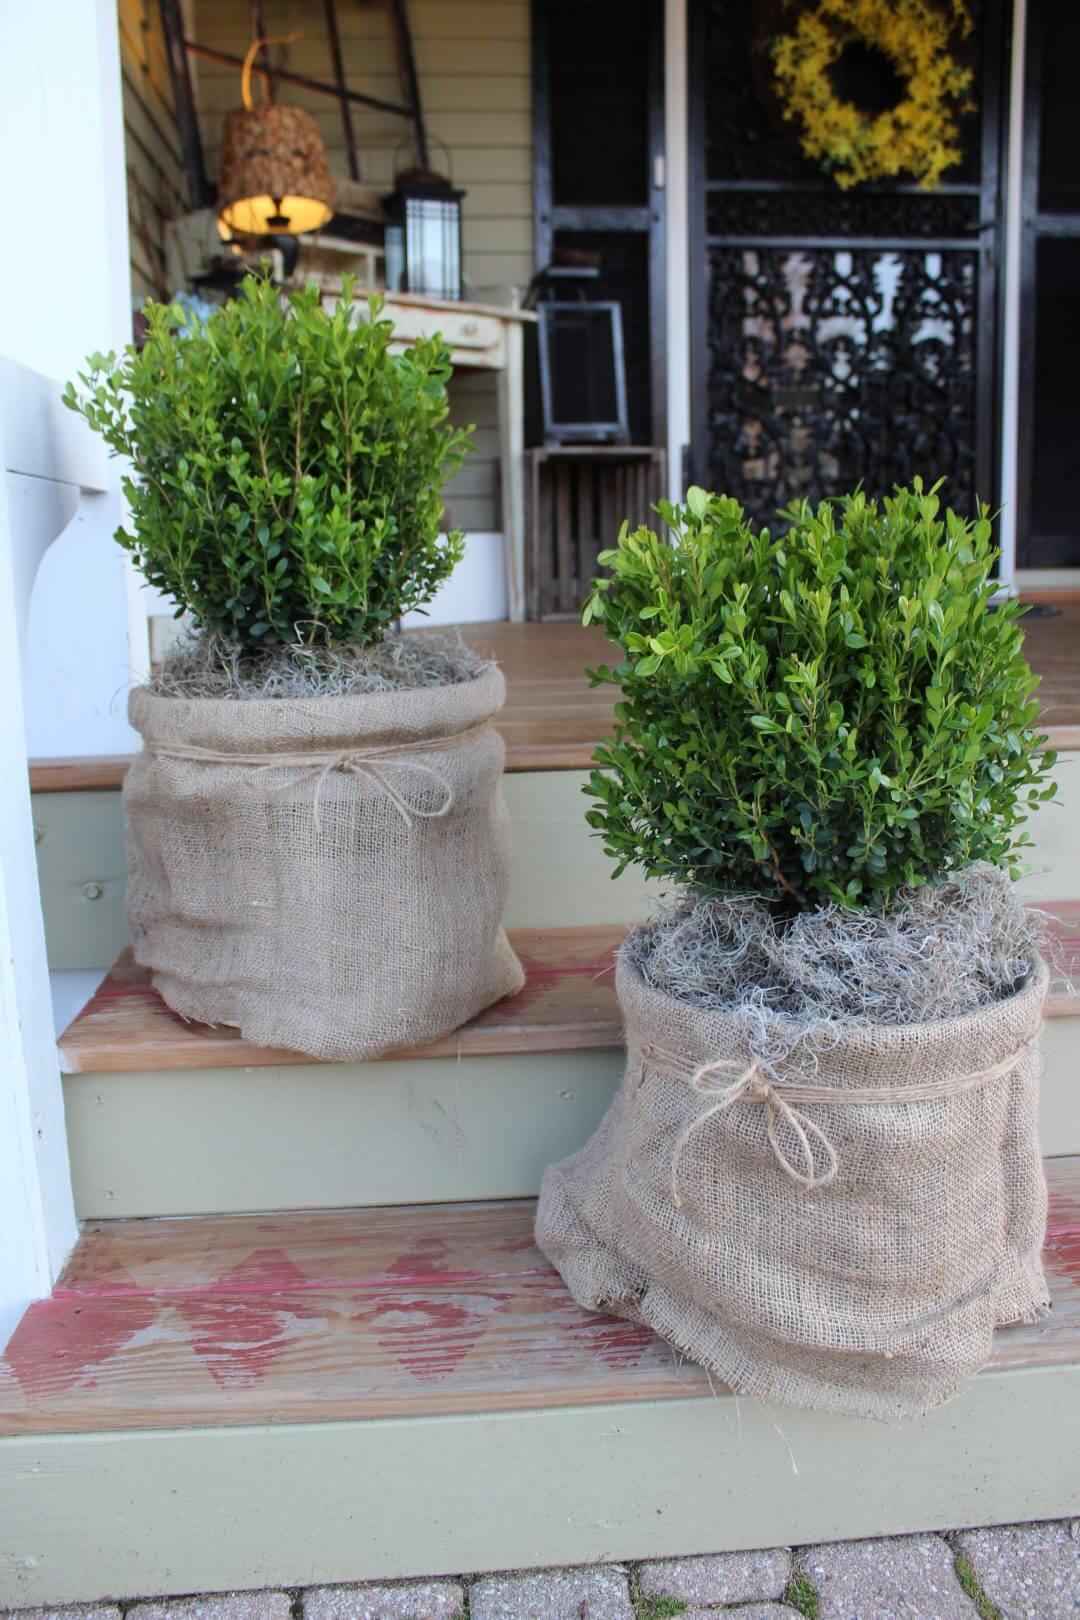 Burlap Bushel and a Peck of Porch Plant Perfection